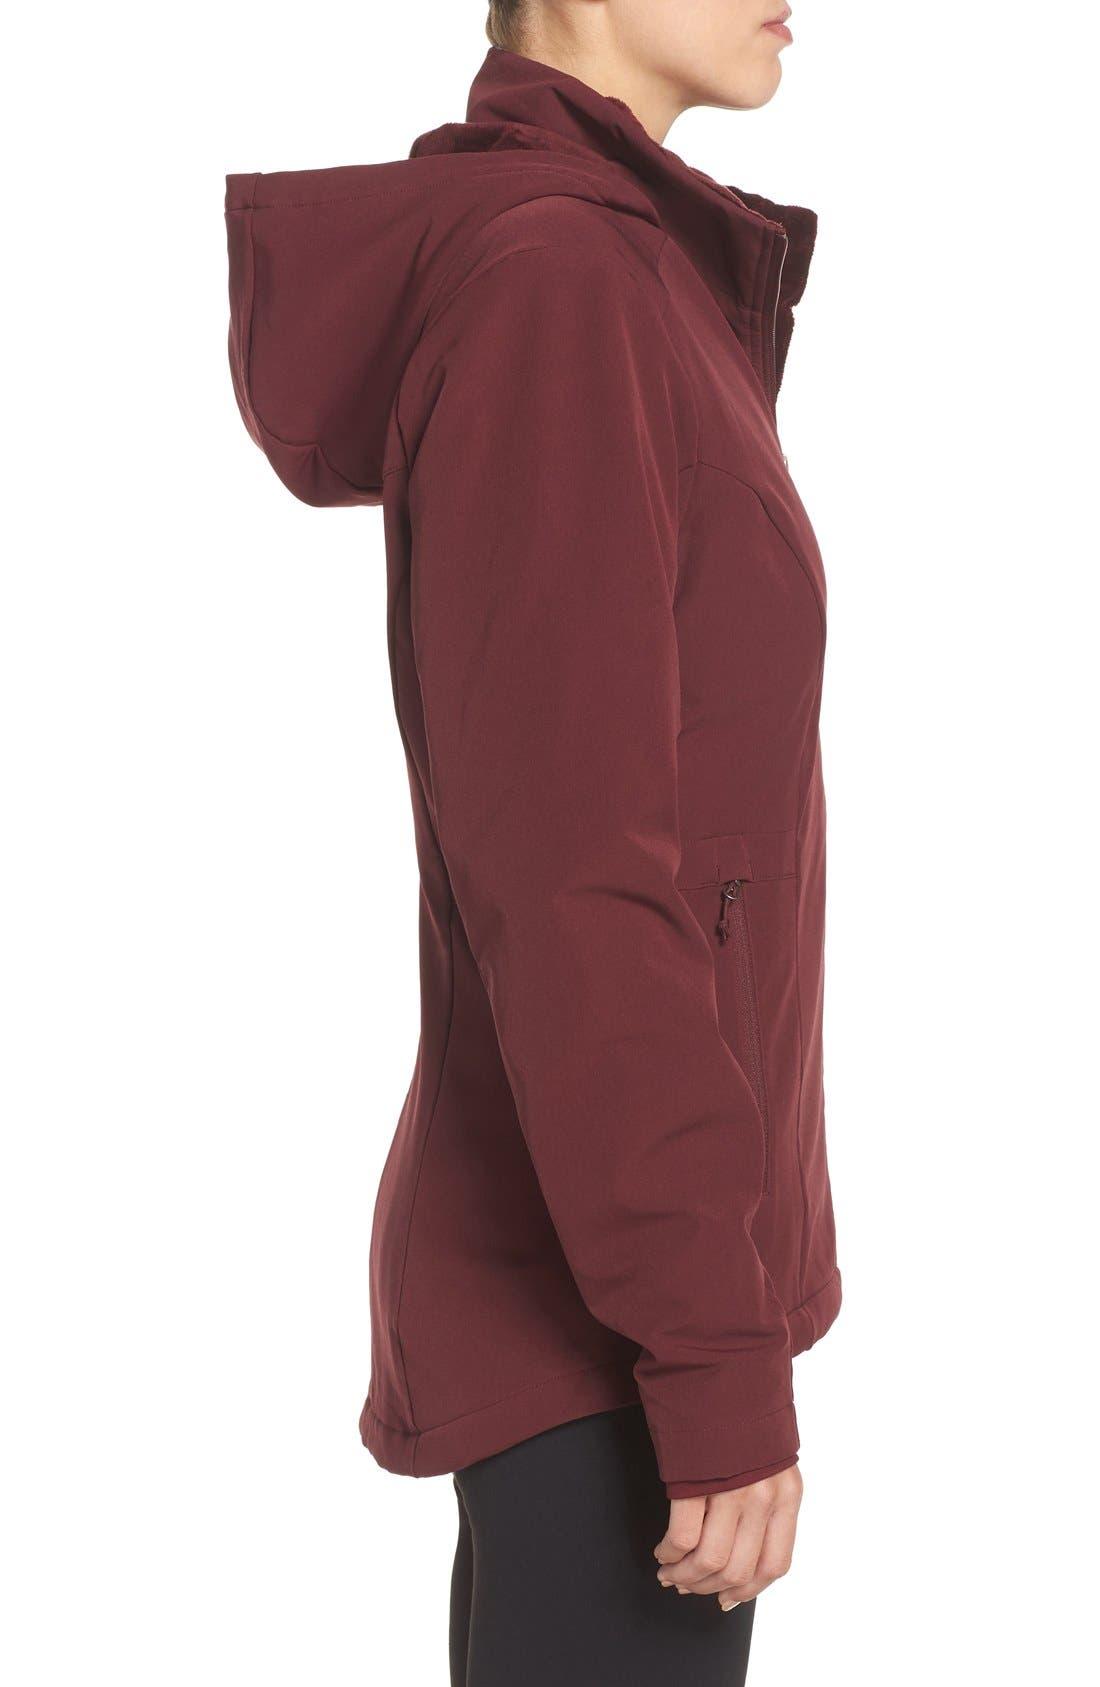 'Shelbe Raschel' Softshell Jacket,                             Alternate thumbnail 3, color,                             Deep Garnet Red